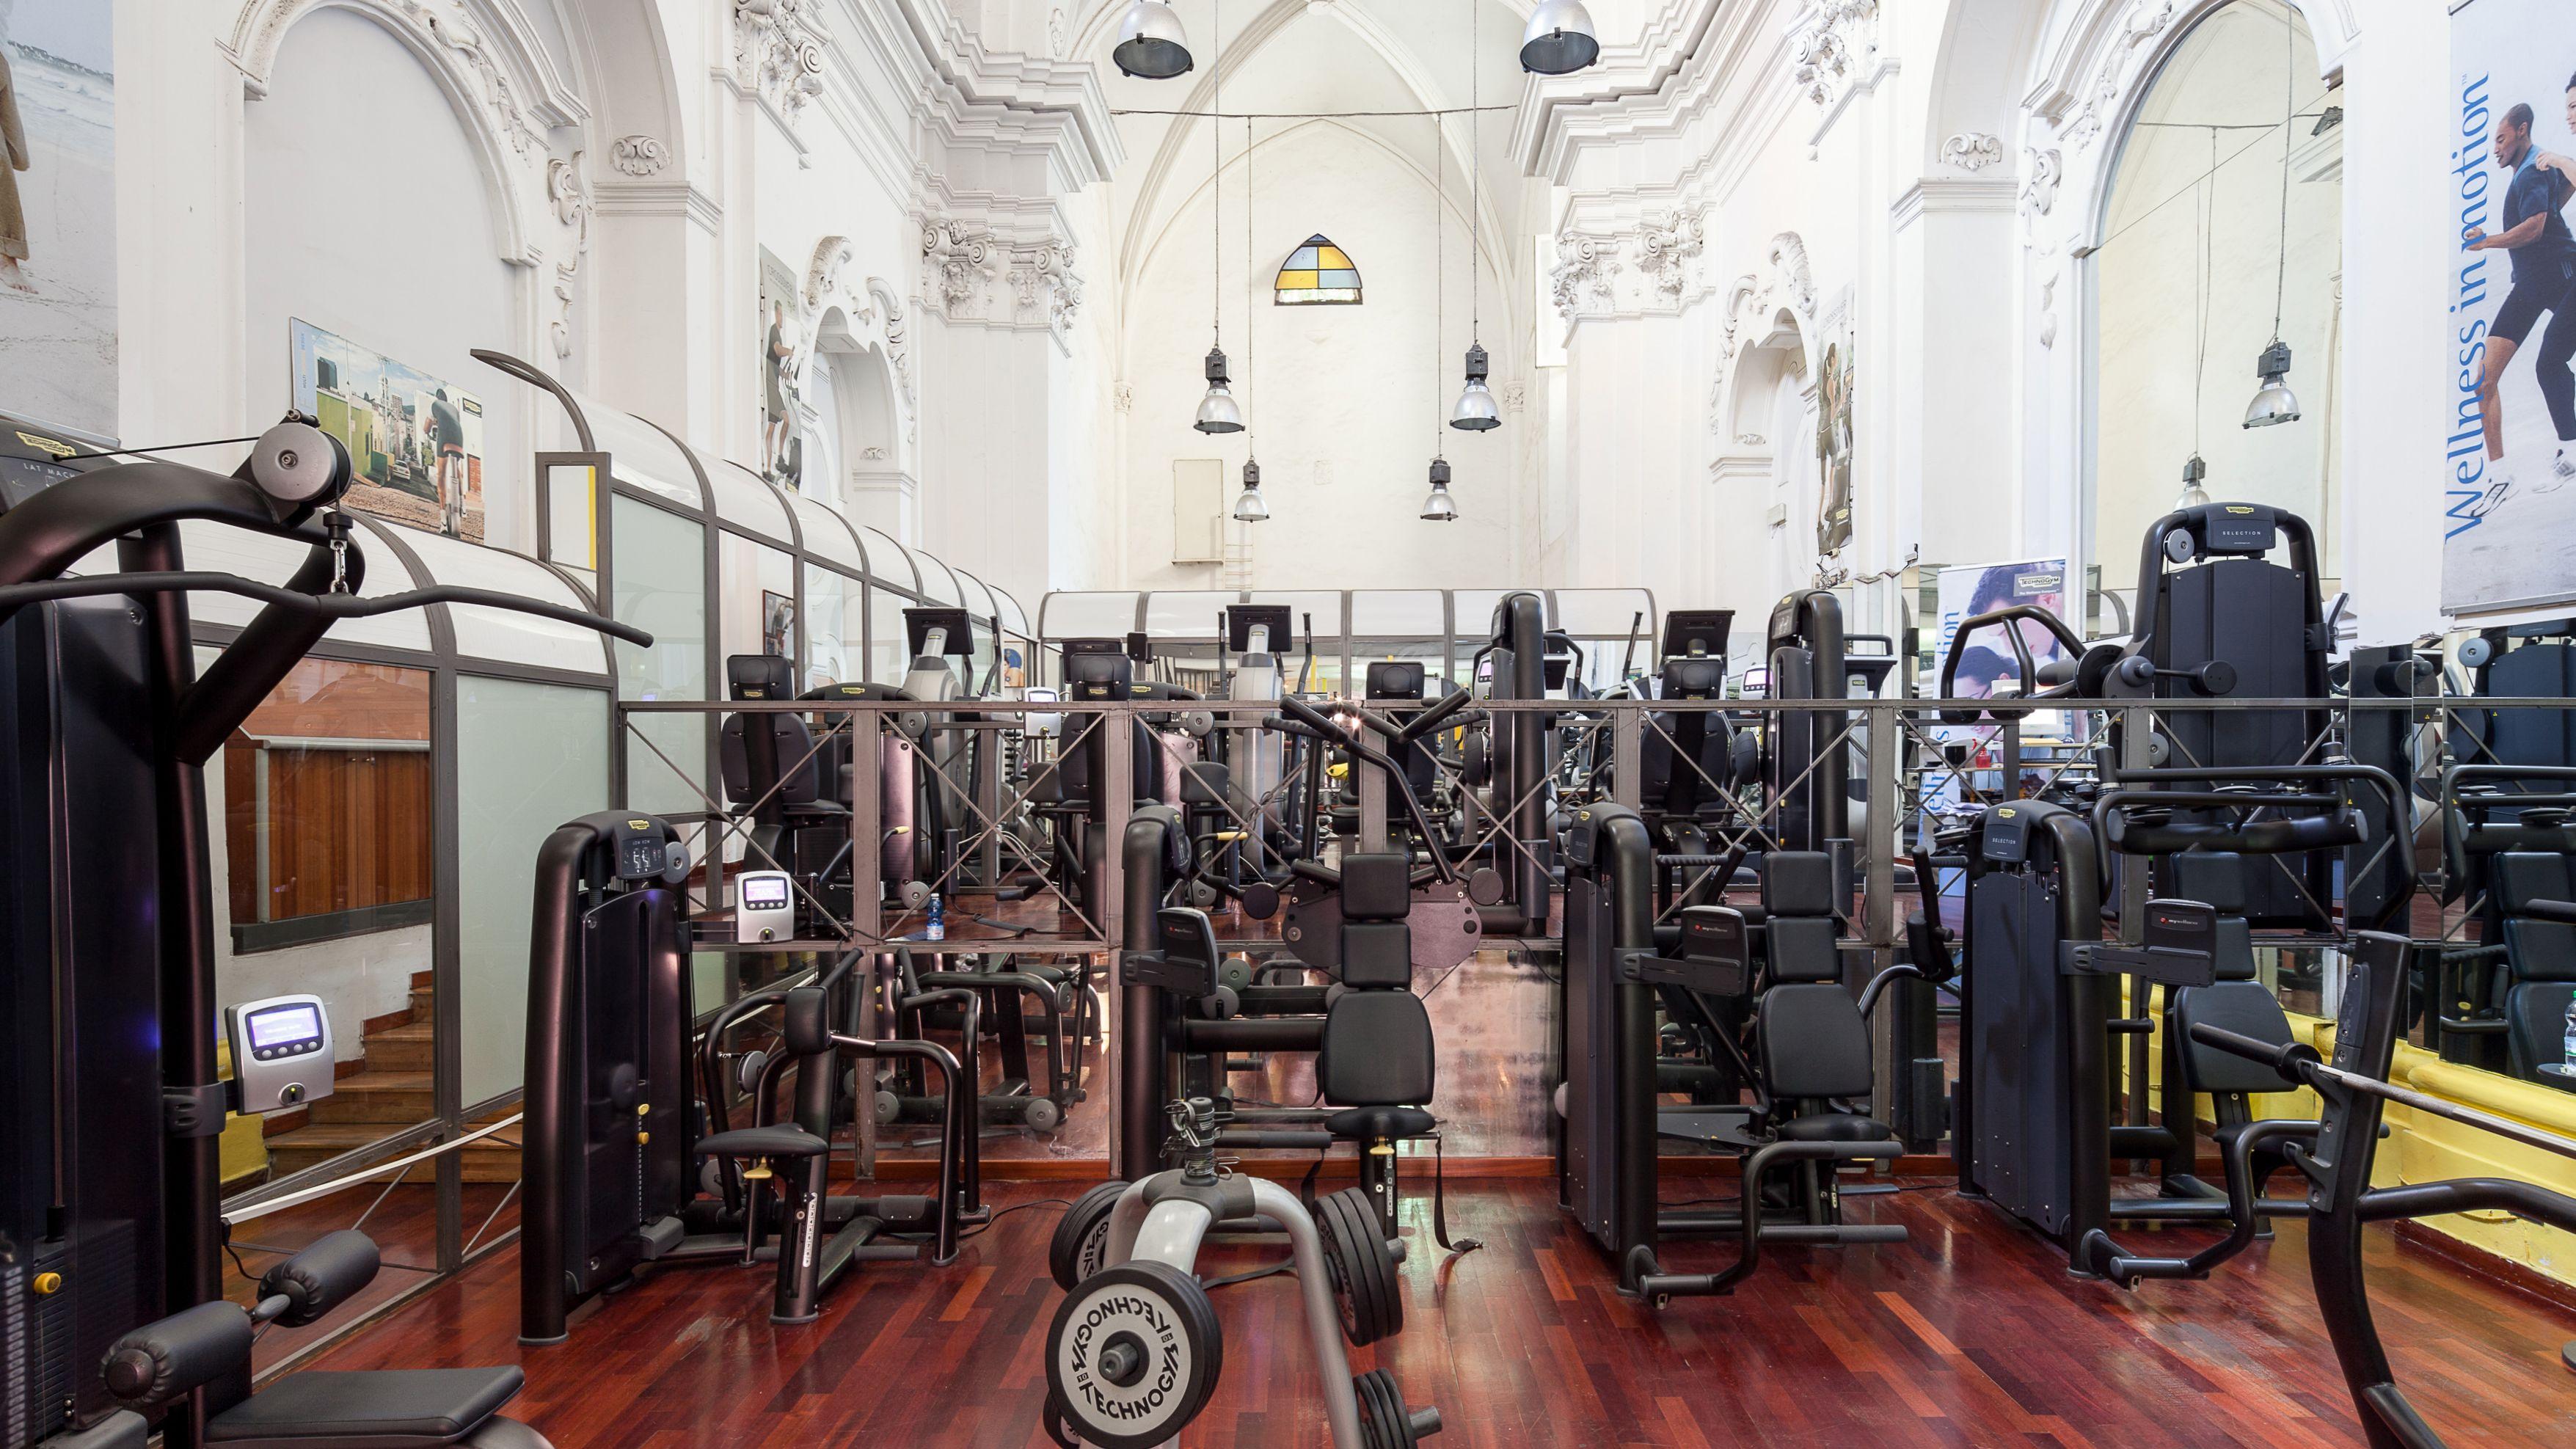 In einer ehemaligen Kirche in Napoli stehen heute statt Kirchenbänke Fitnessgeräte.